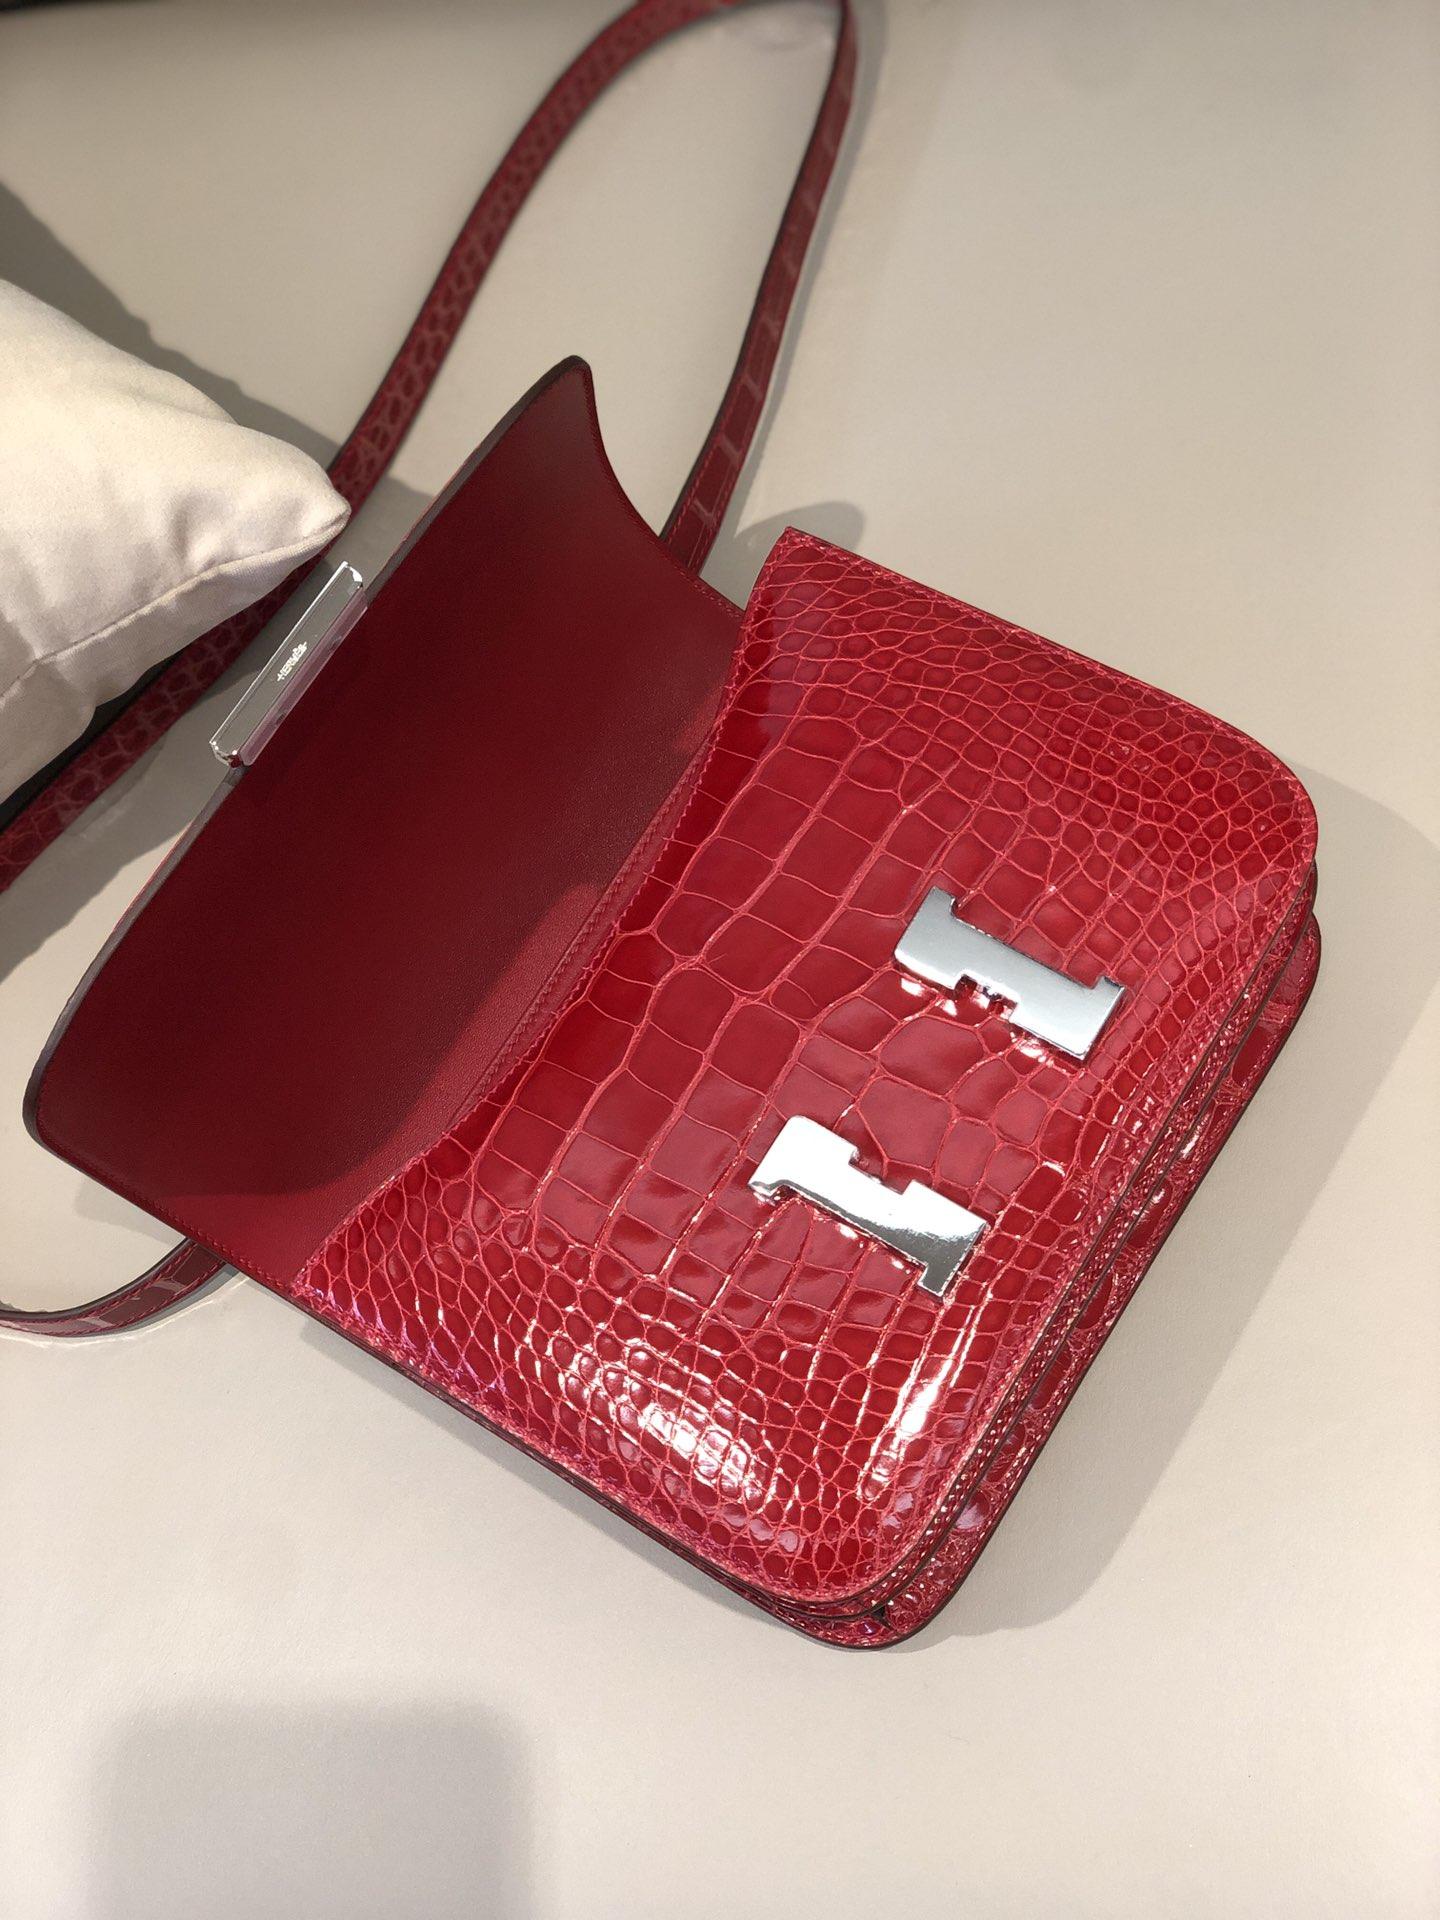 Stock Hermes CK95 Braise Shiny Crocodile Constance Bag24cm Silver Hardware